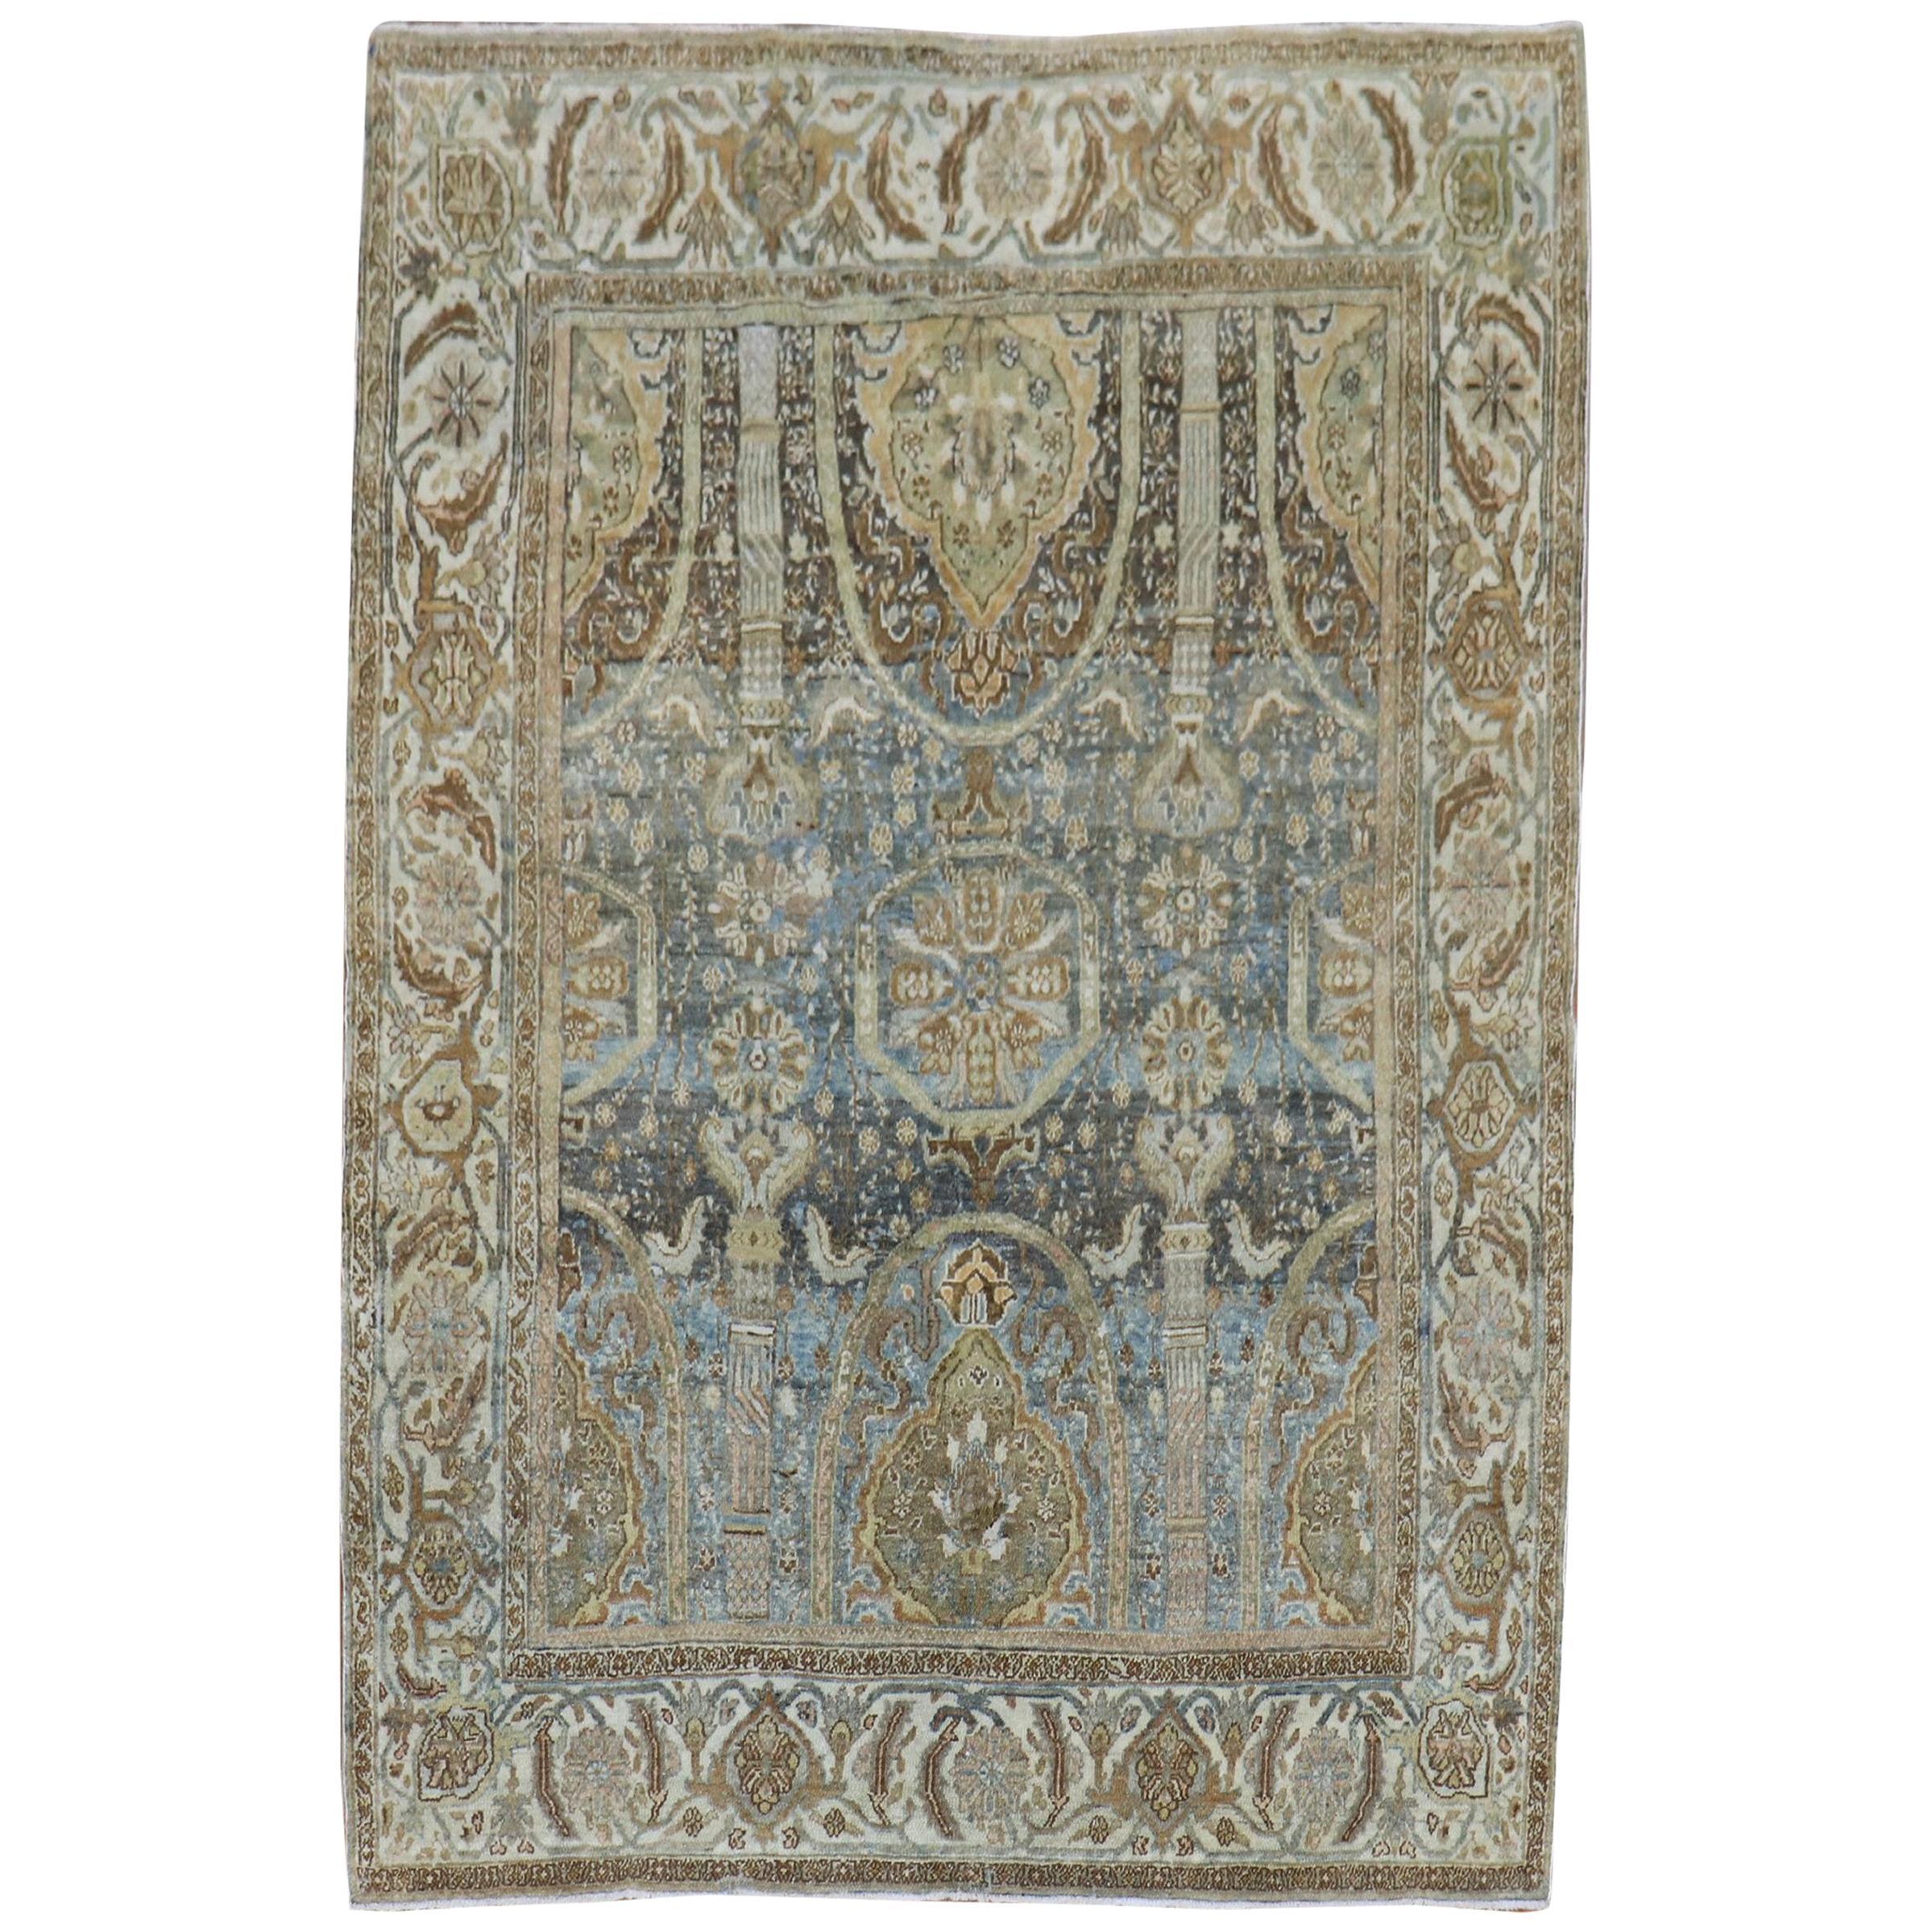 Captivating Antique Persian Senneh Rug